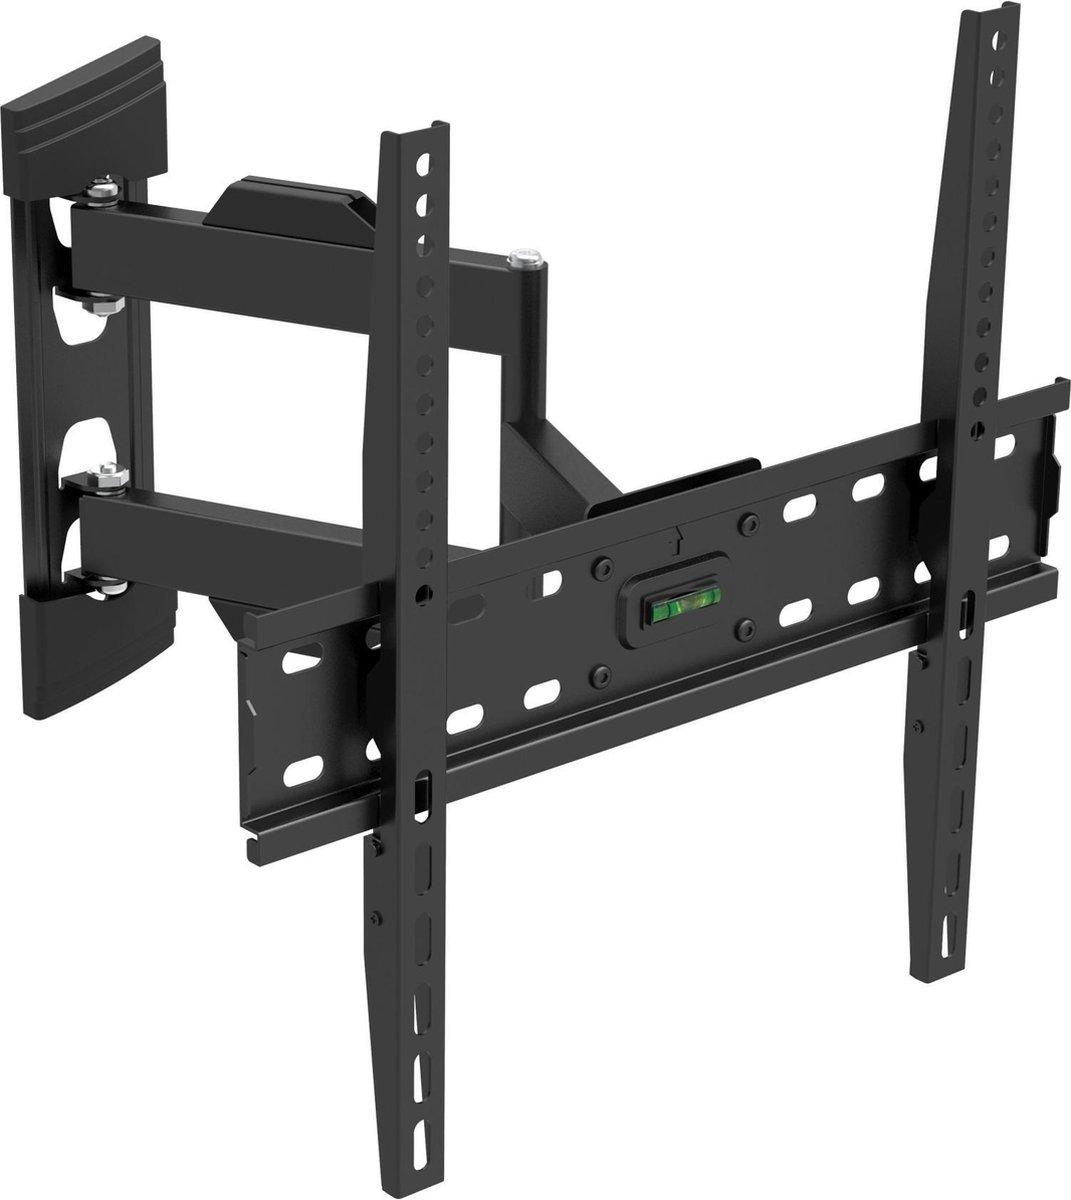 Belife  Universele TV Muurbeugel 32 tot en met 55 inch   Full Motion Extra Slim   TV Wall mount